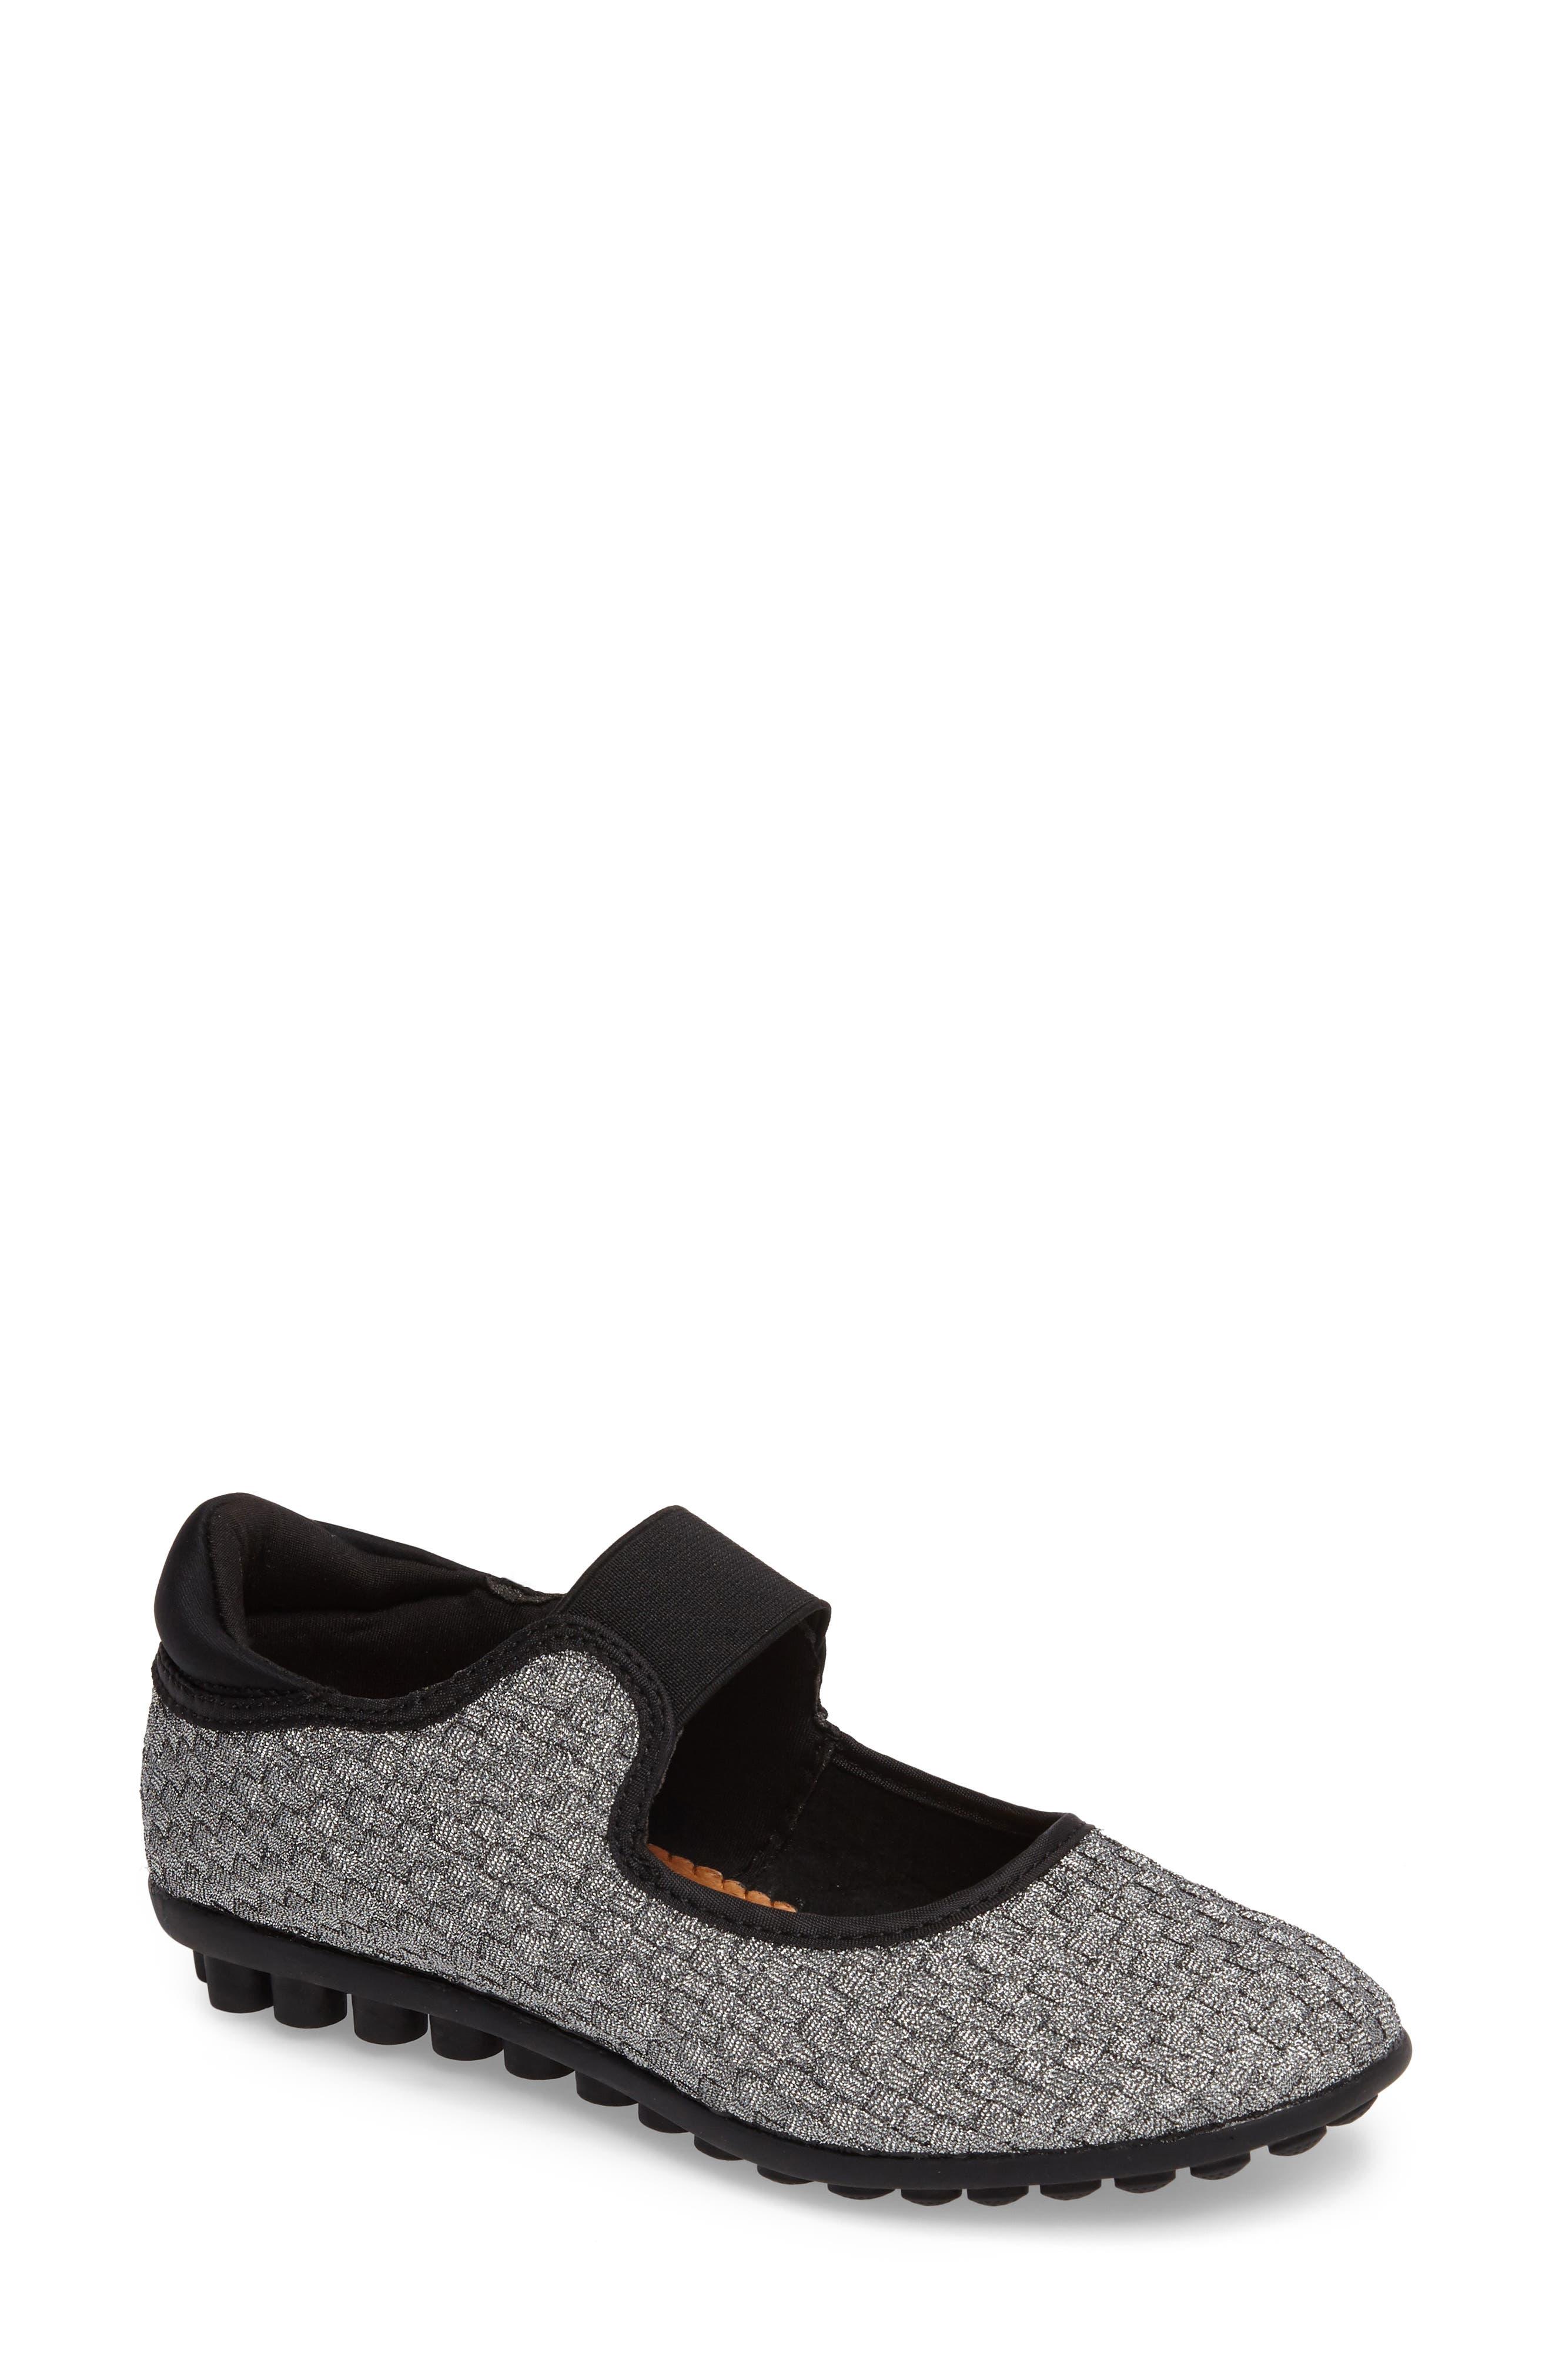 Bernie Mev Kendra Mary Jane Sneaker, Grey